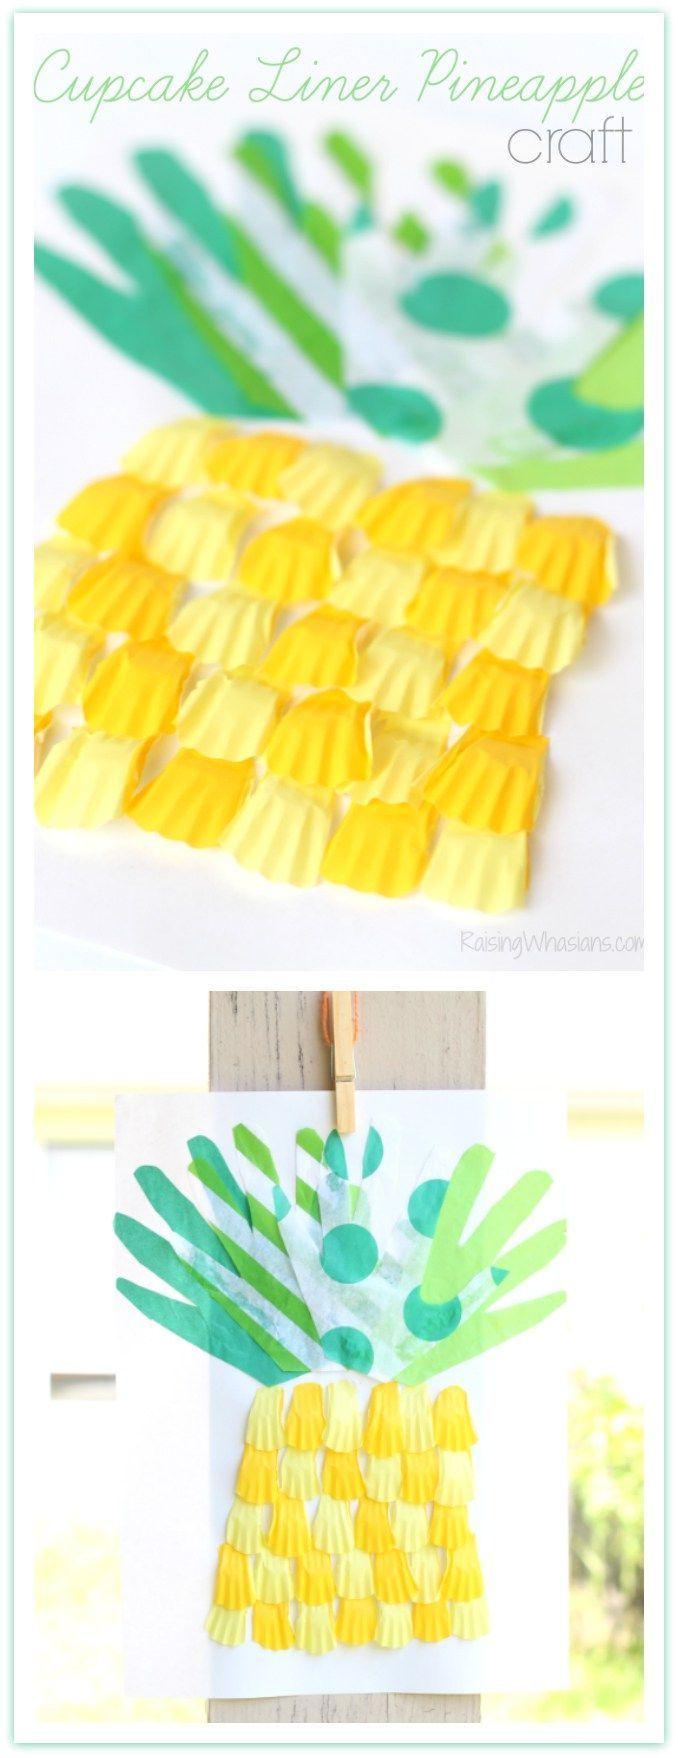 e1c8ecc3cfa Cupcake Liner Pineapple Craft